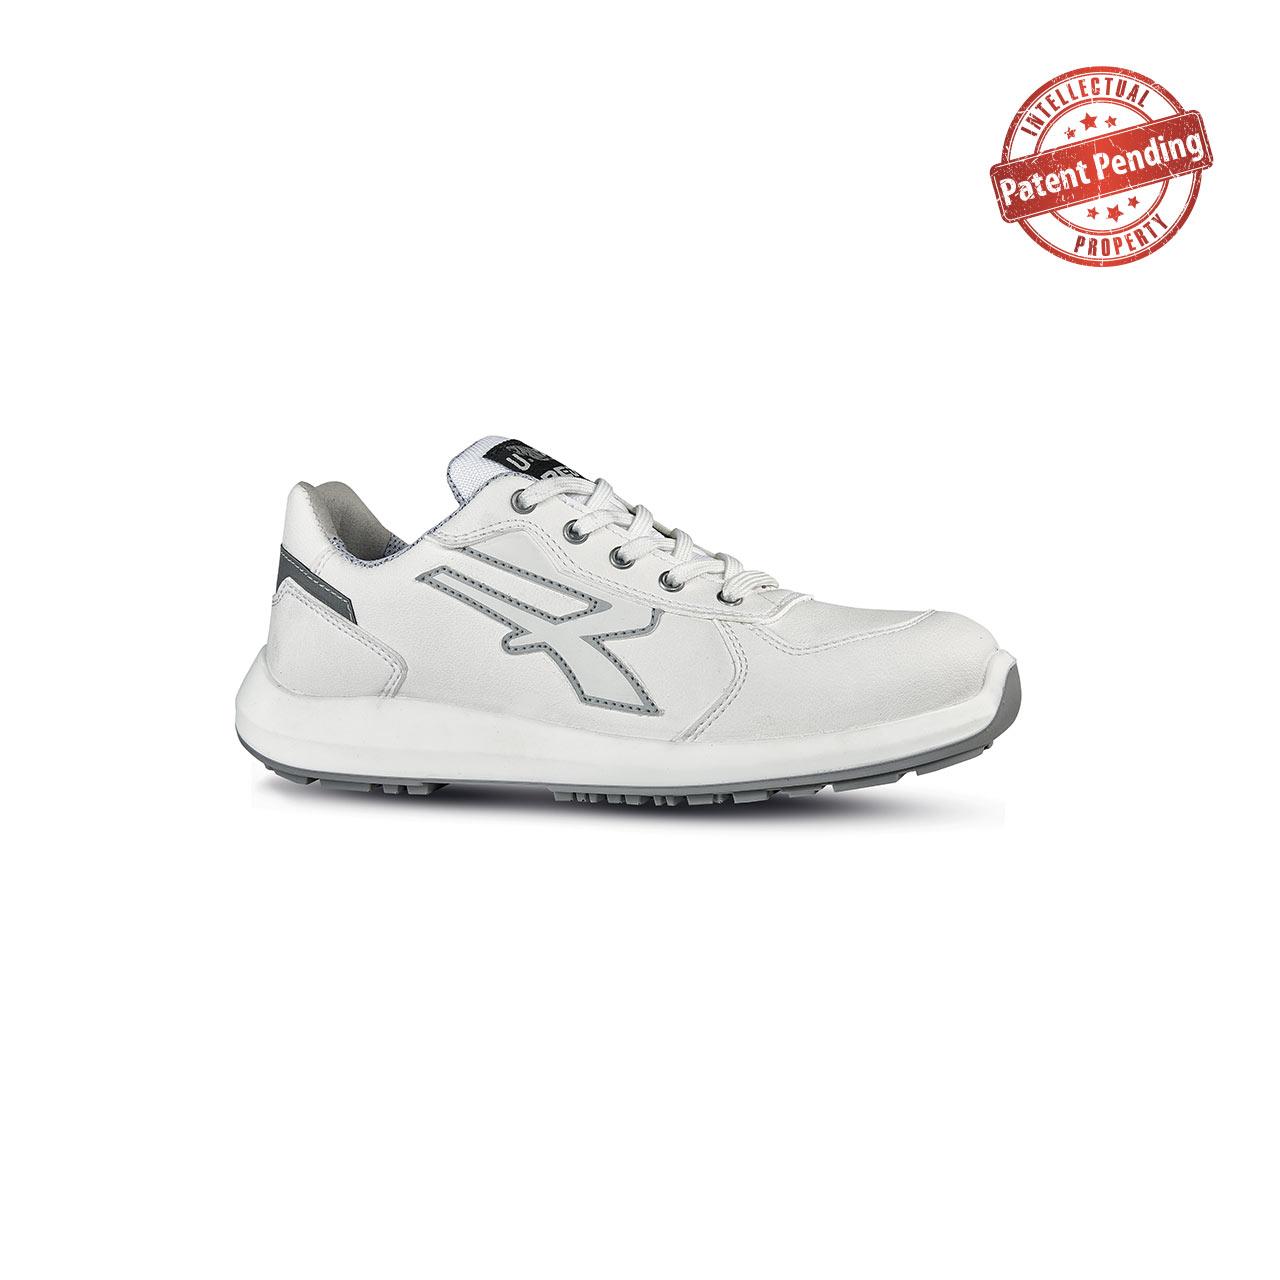 scarpa antinfortunistica alta upower modello virgo linea redup vista laterale